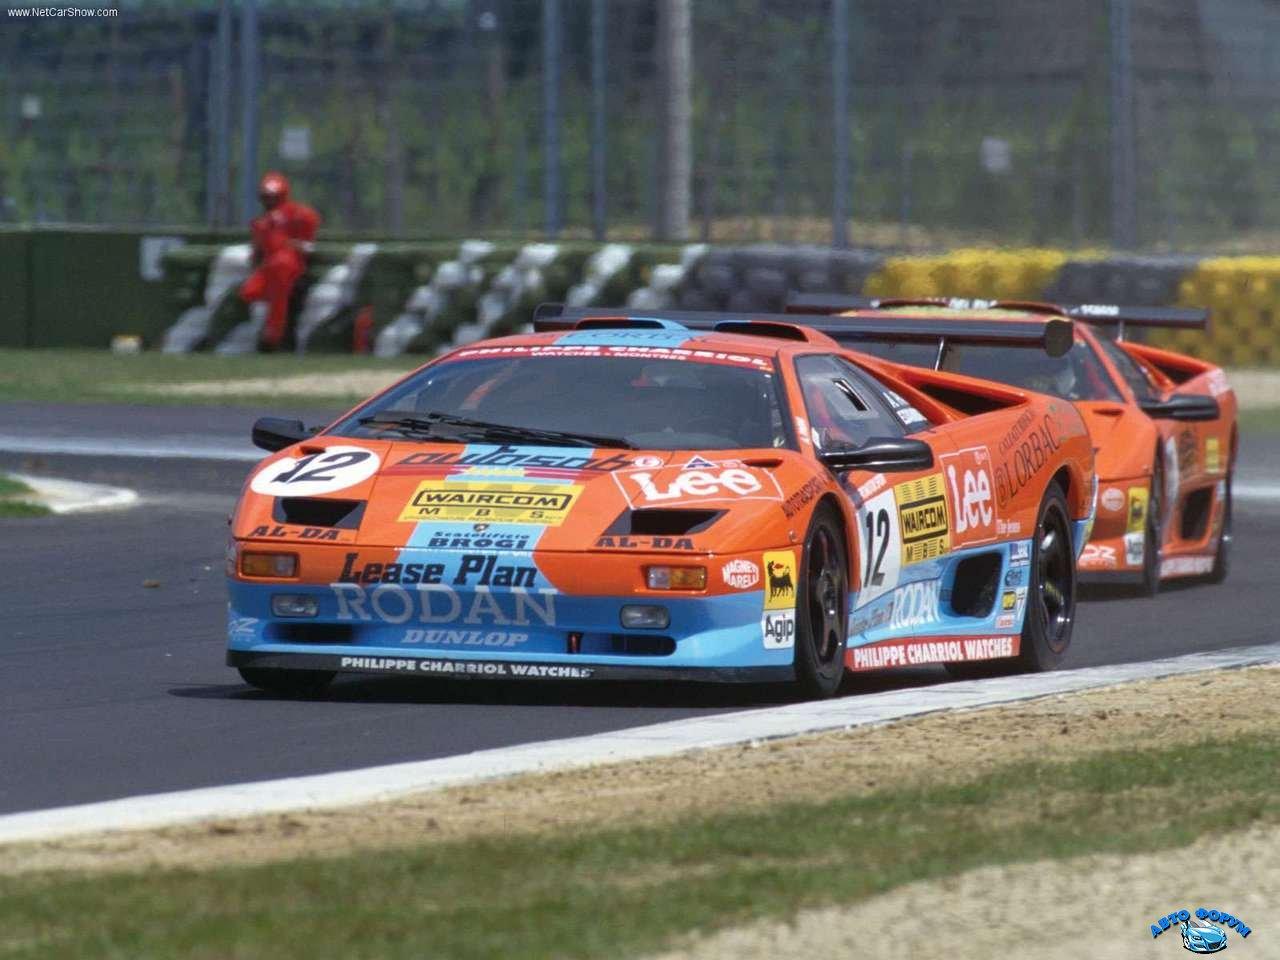 Lamborghini-Diablo_SVR_1996_1280x960_wallpaper_01.jpg